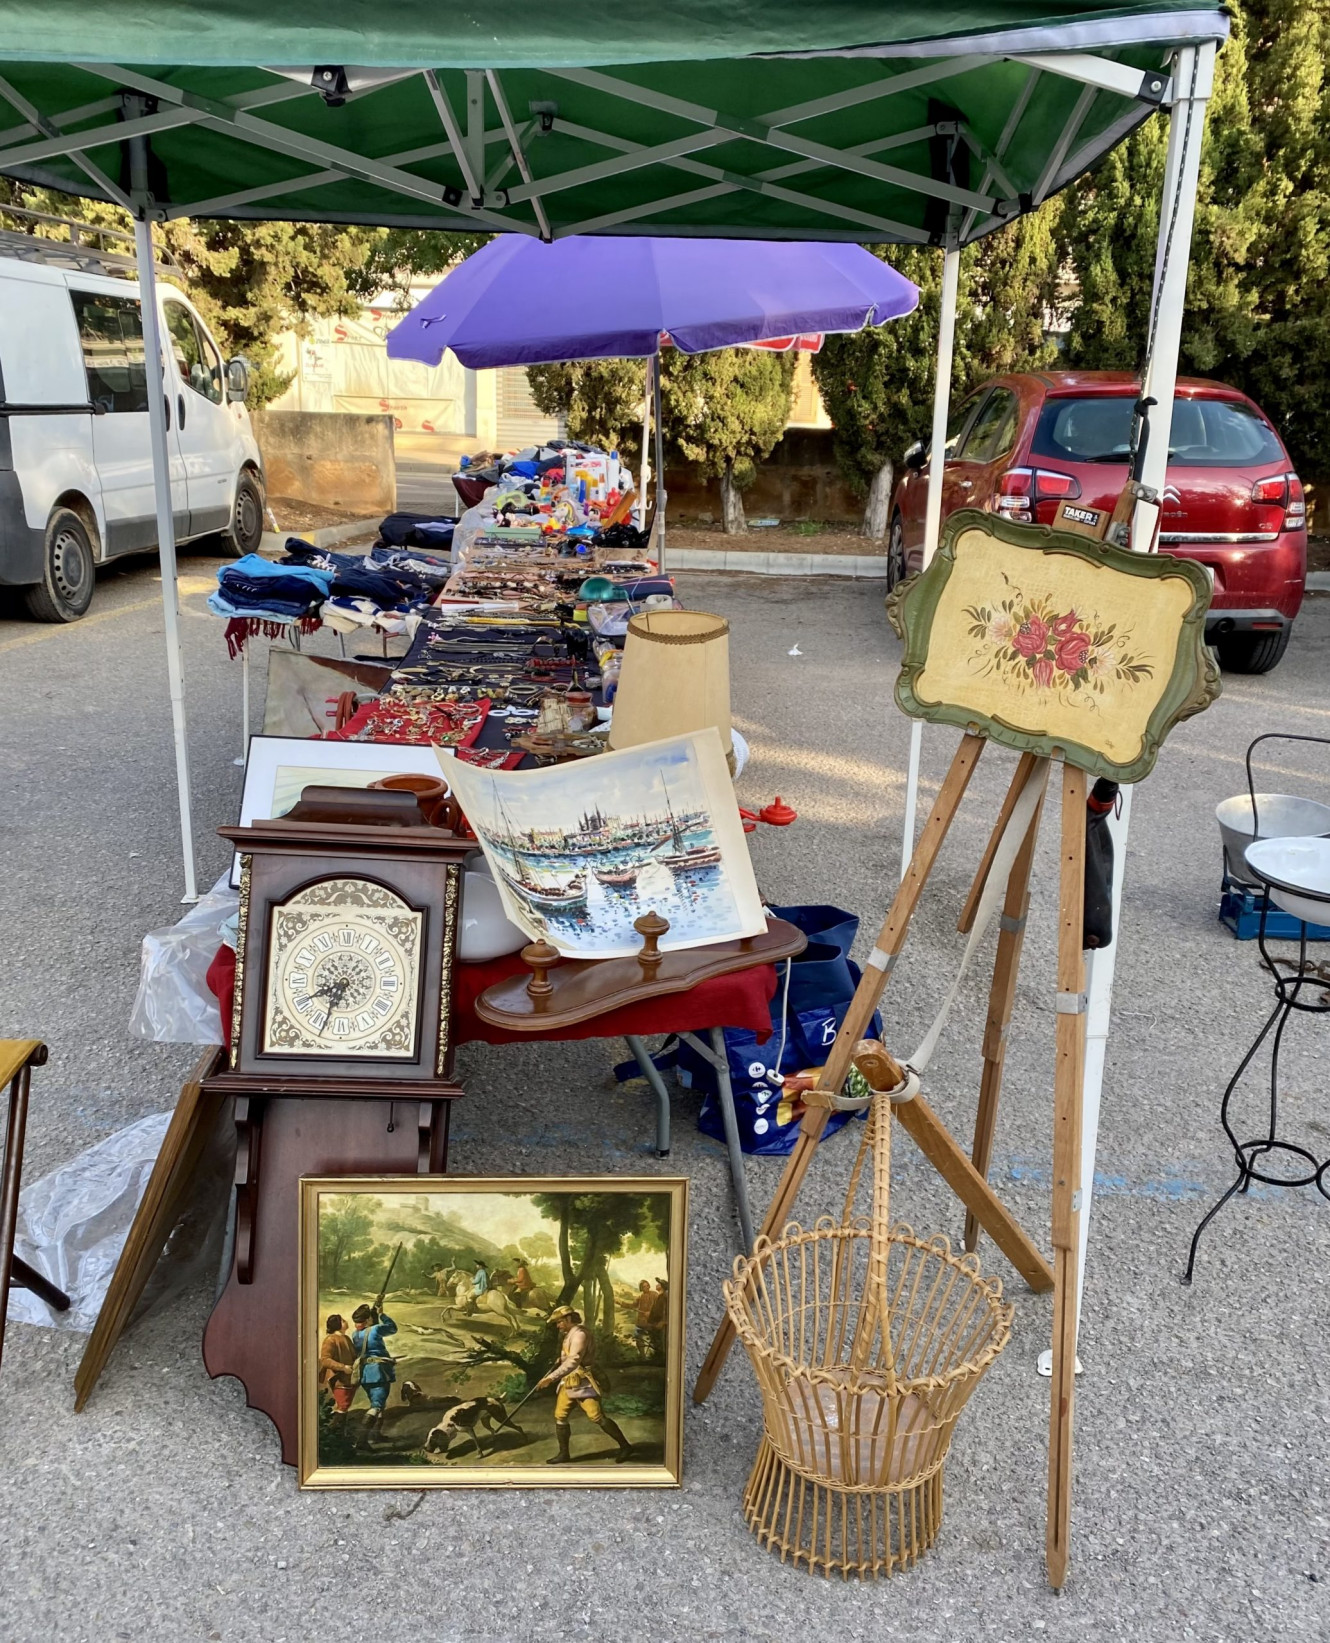 Mallorca Flohmarkt in Consell - Großartig und voller Kuriositäten